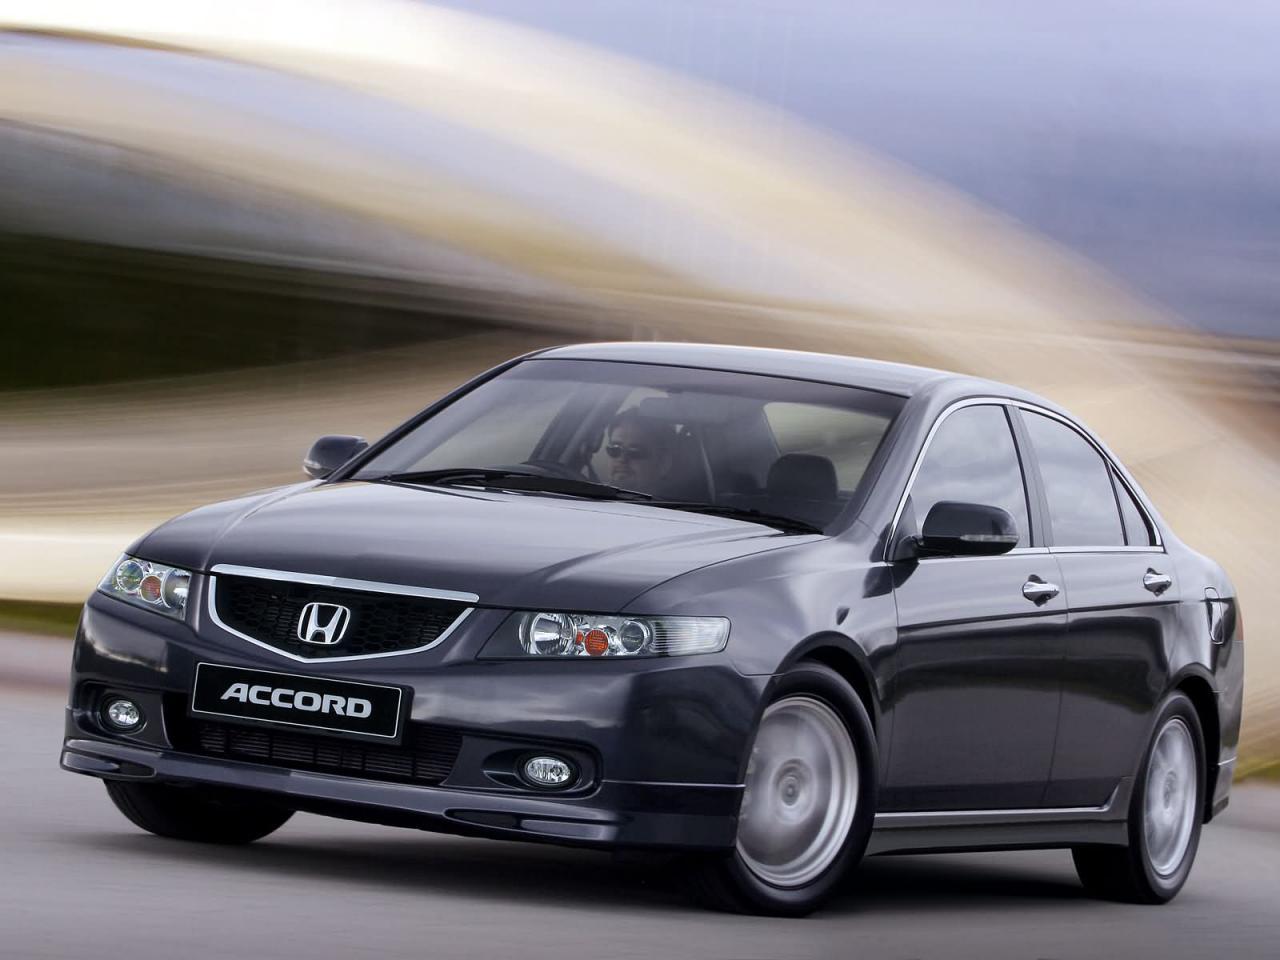 2003 honda accord type s accord 2 4 type s european for Honda accord 2 4